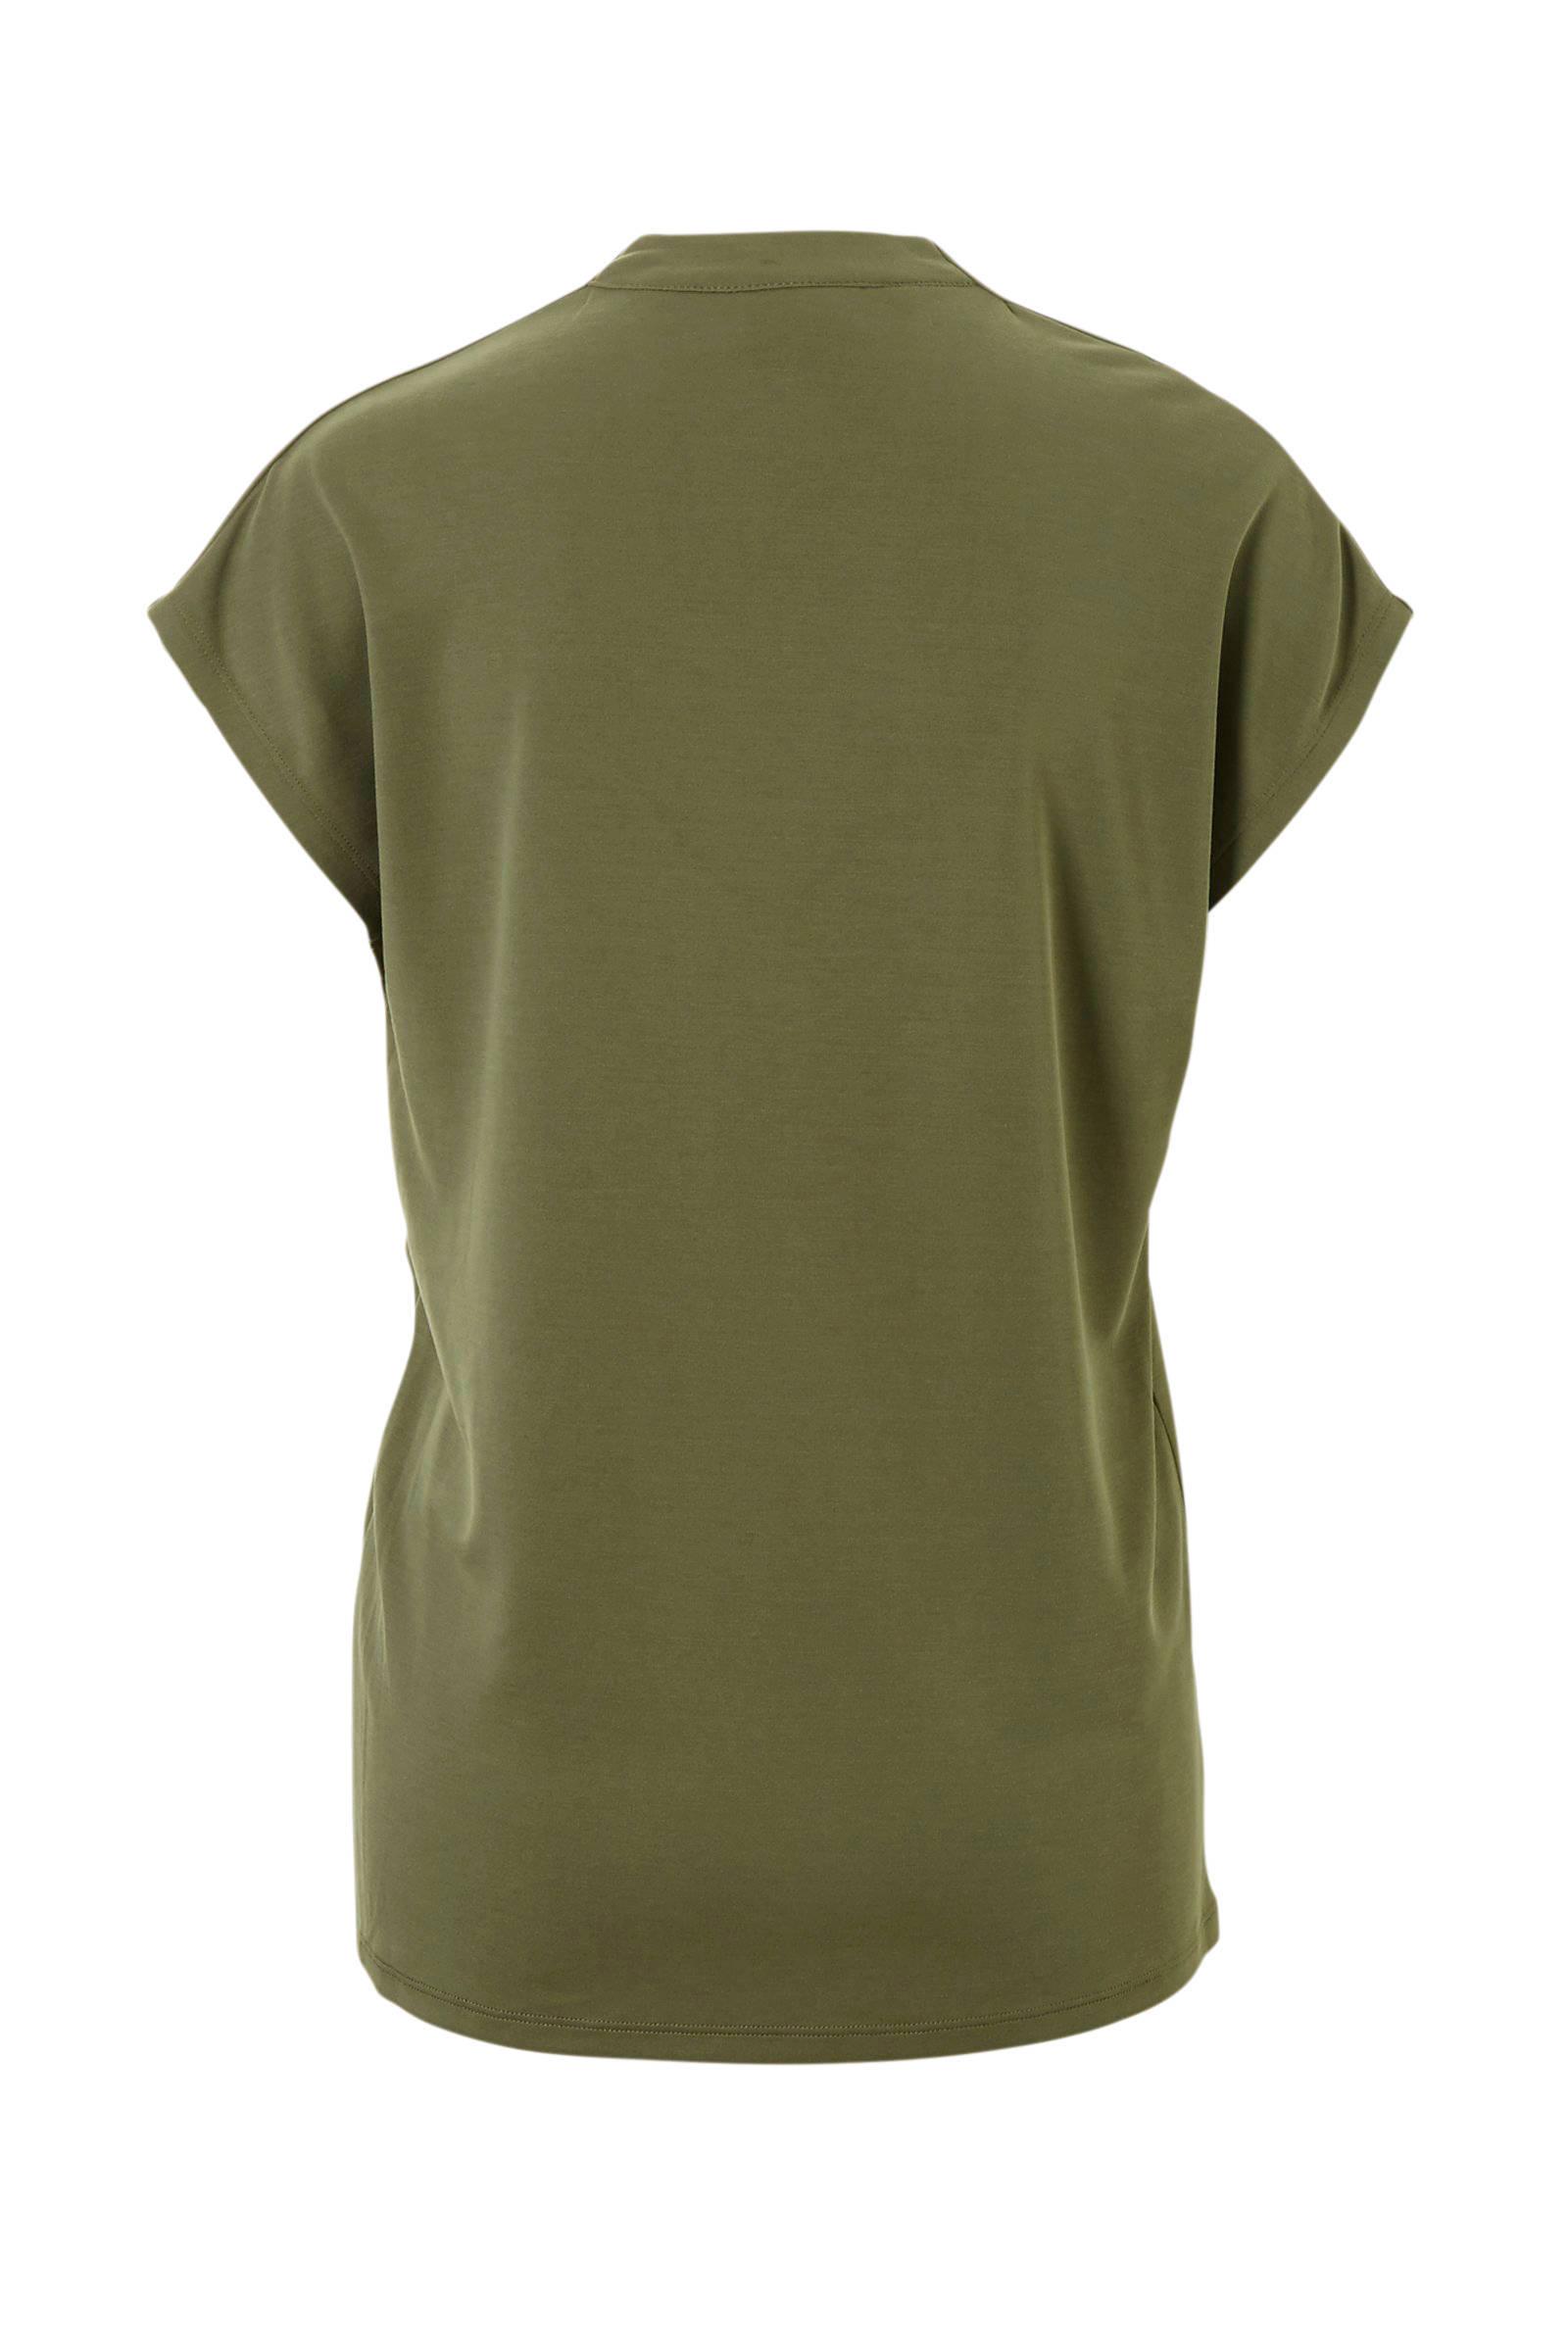 FREEQUENT kaki FREEQUENT blouse kaki blouse kaki FREEQUENT blouse kaki blouse FREEQUENT Cw5aqr54